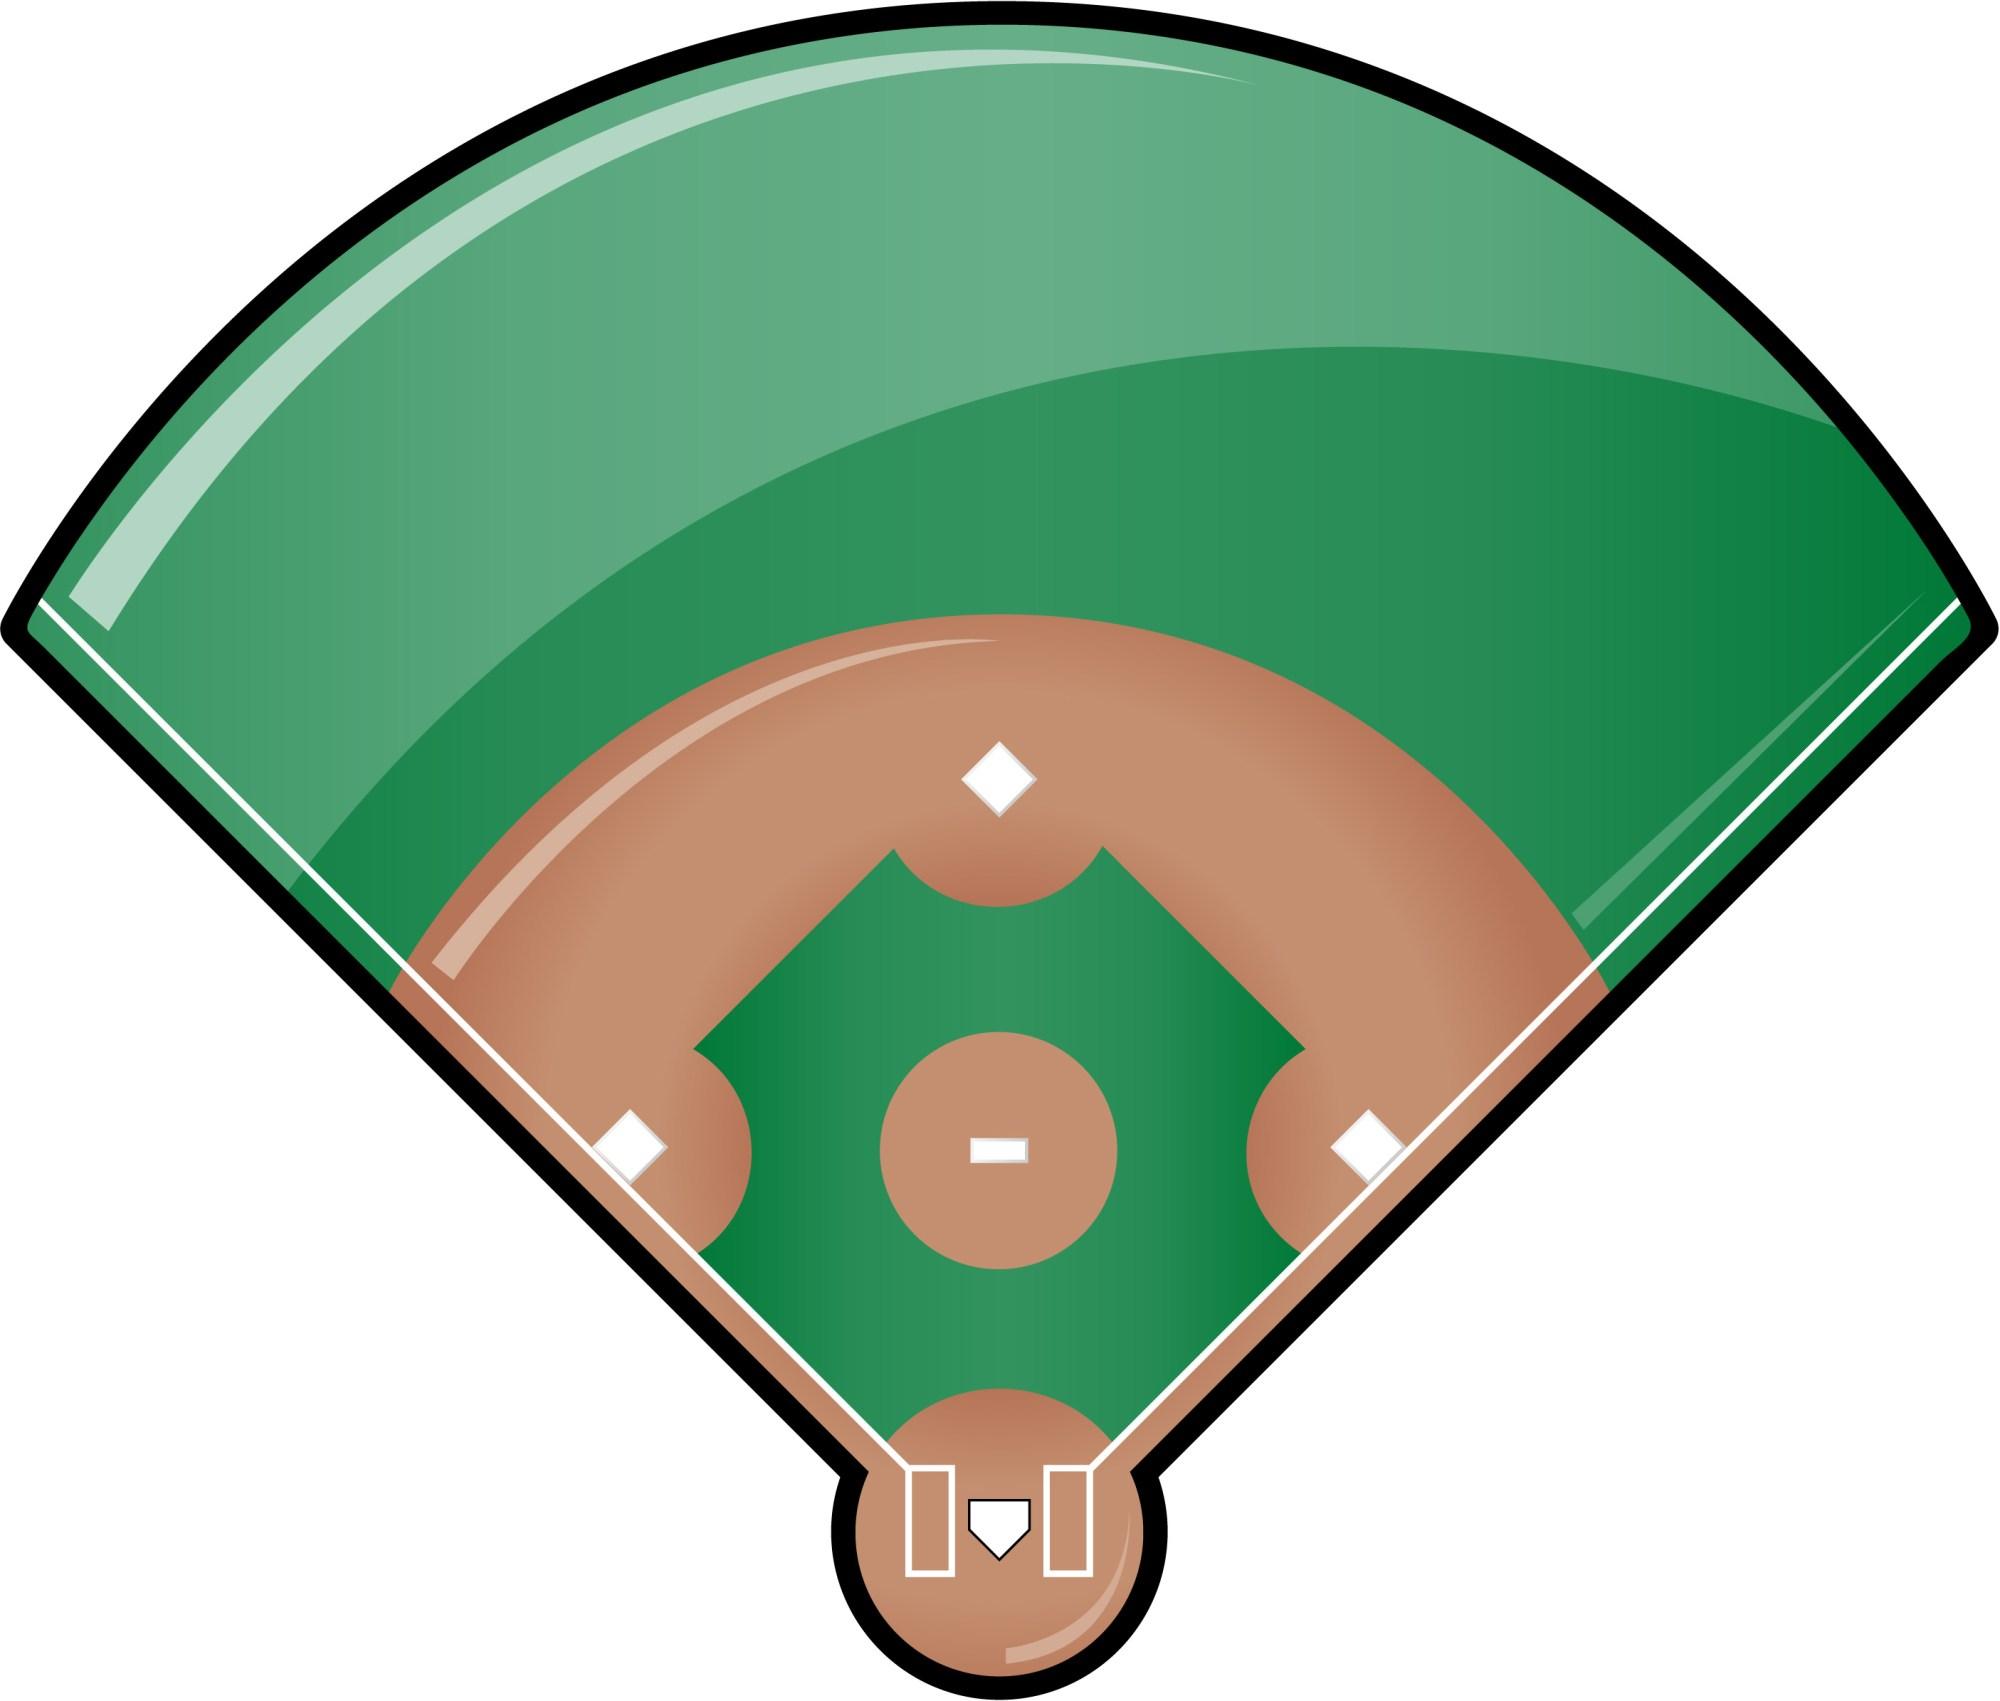 hight resolution of softball diamond clipart